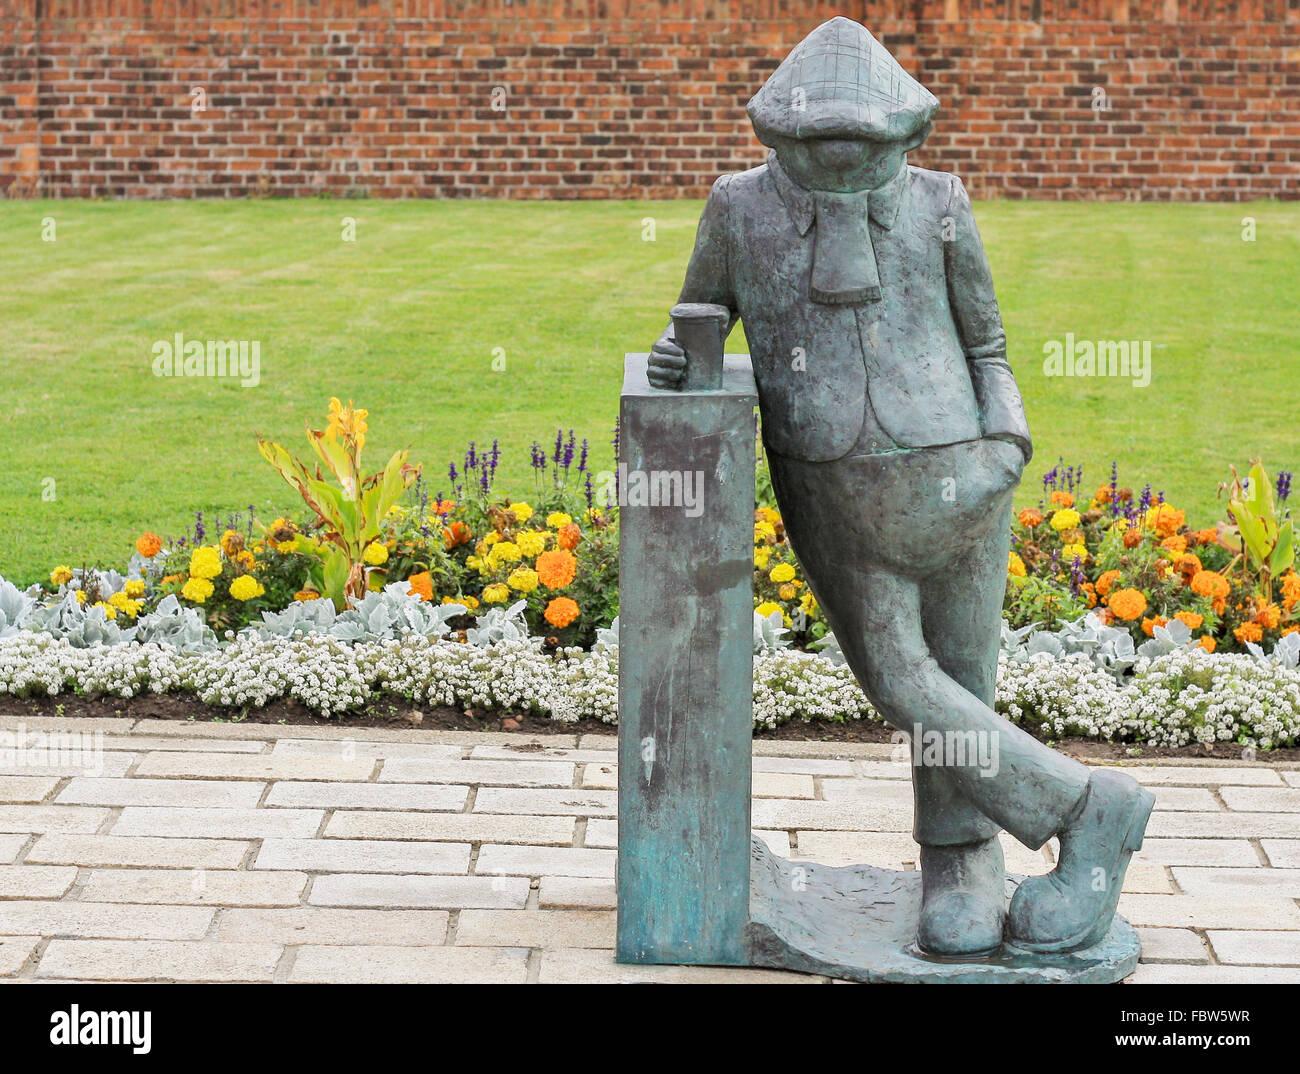 Famous celebrity life size display statues fiberglass / resin